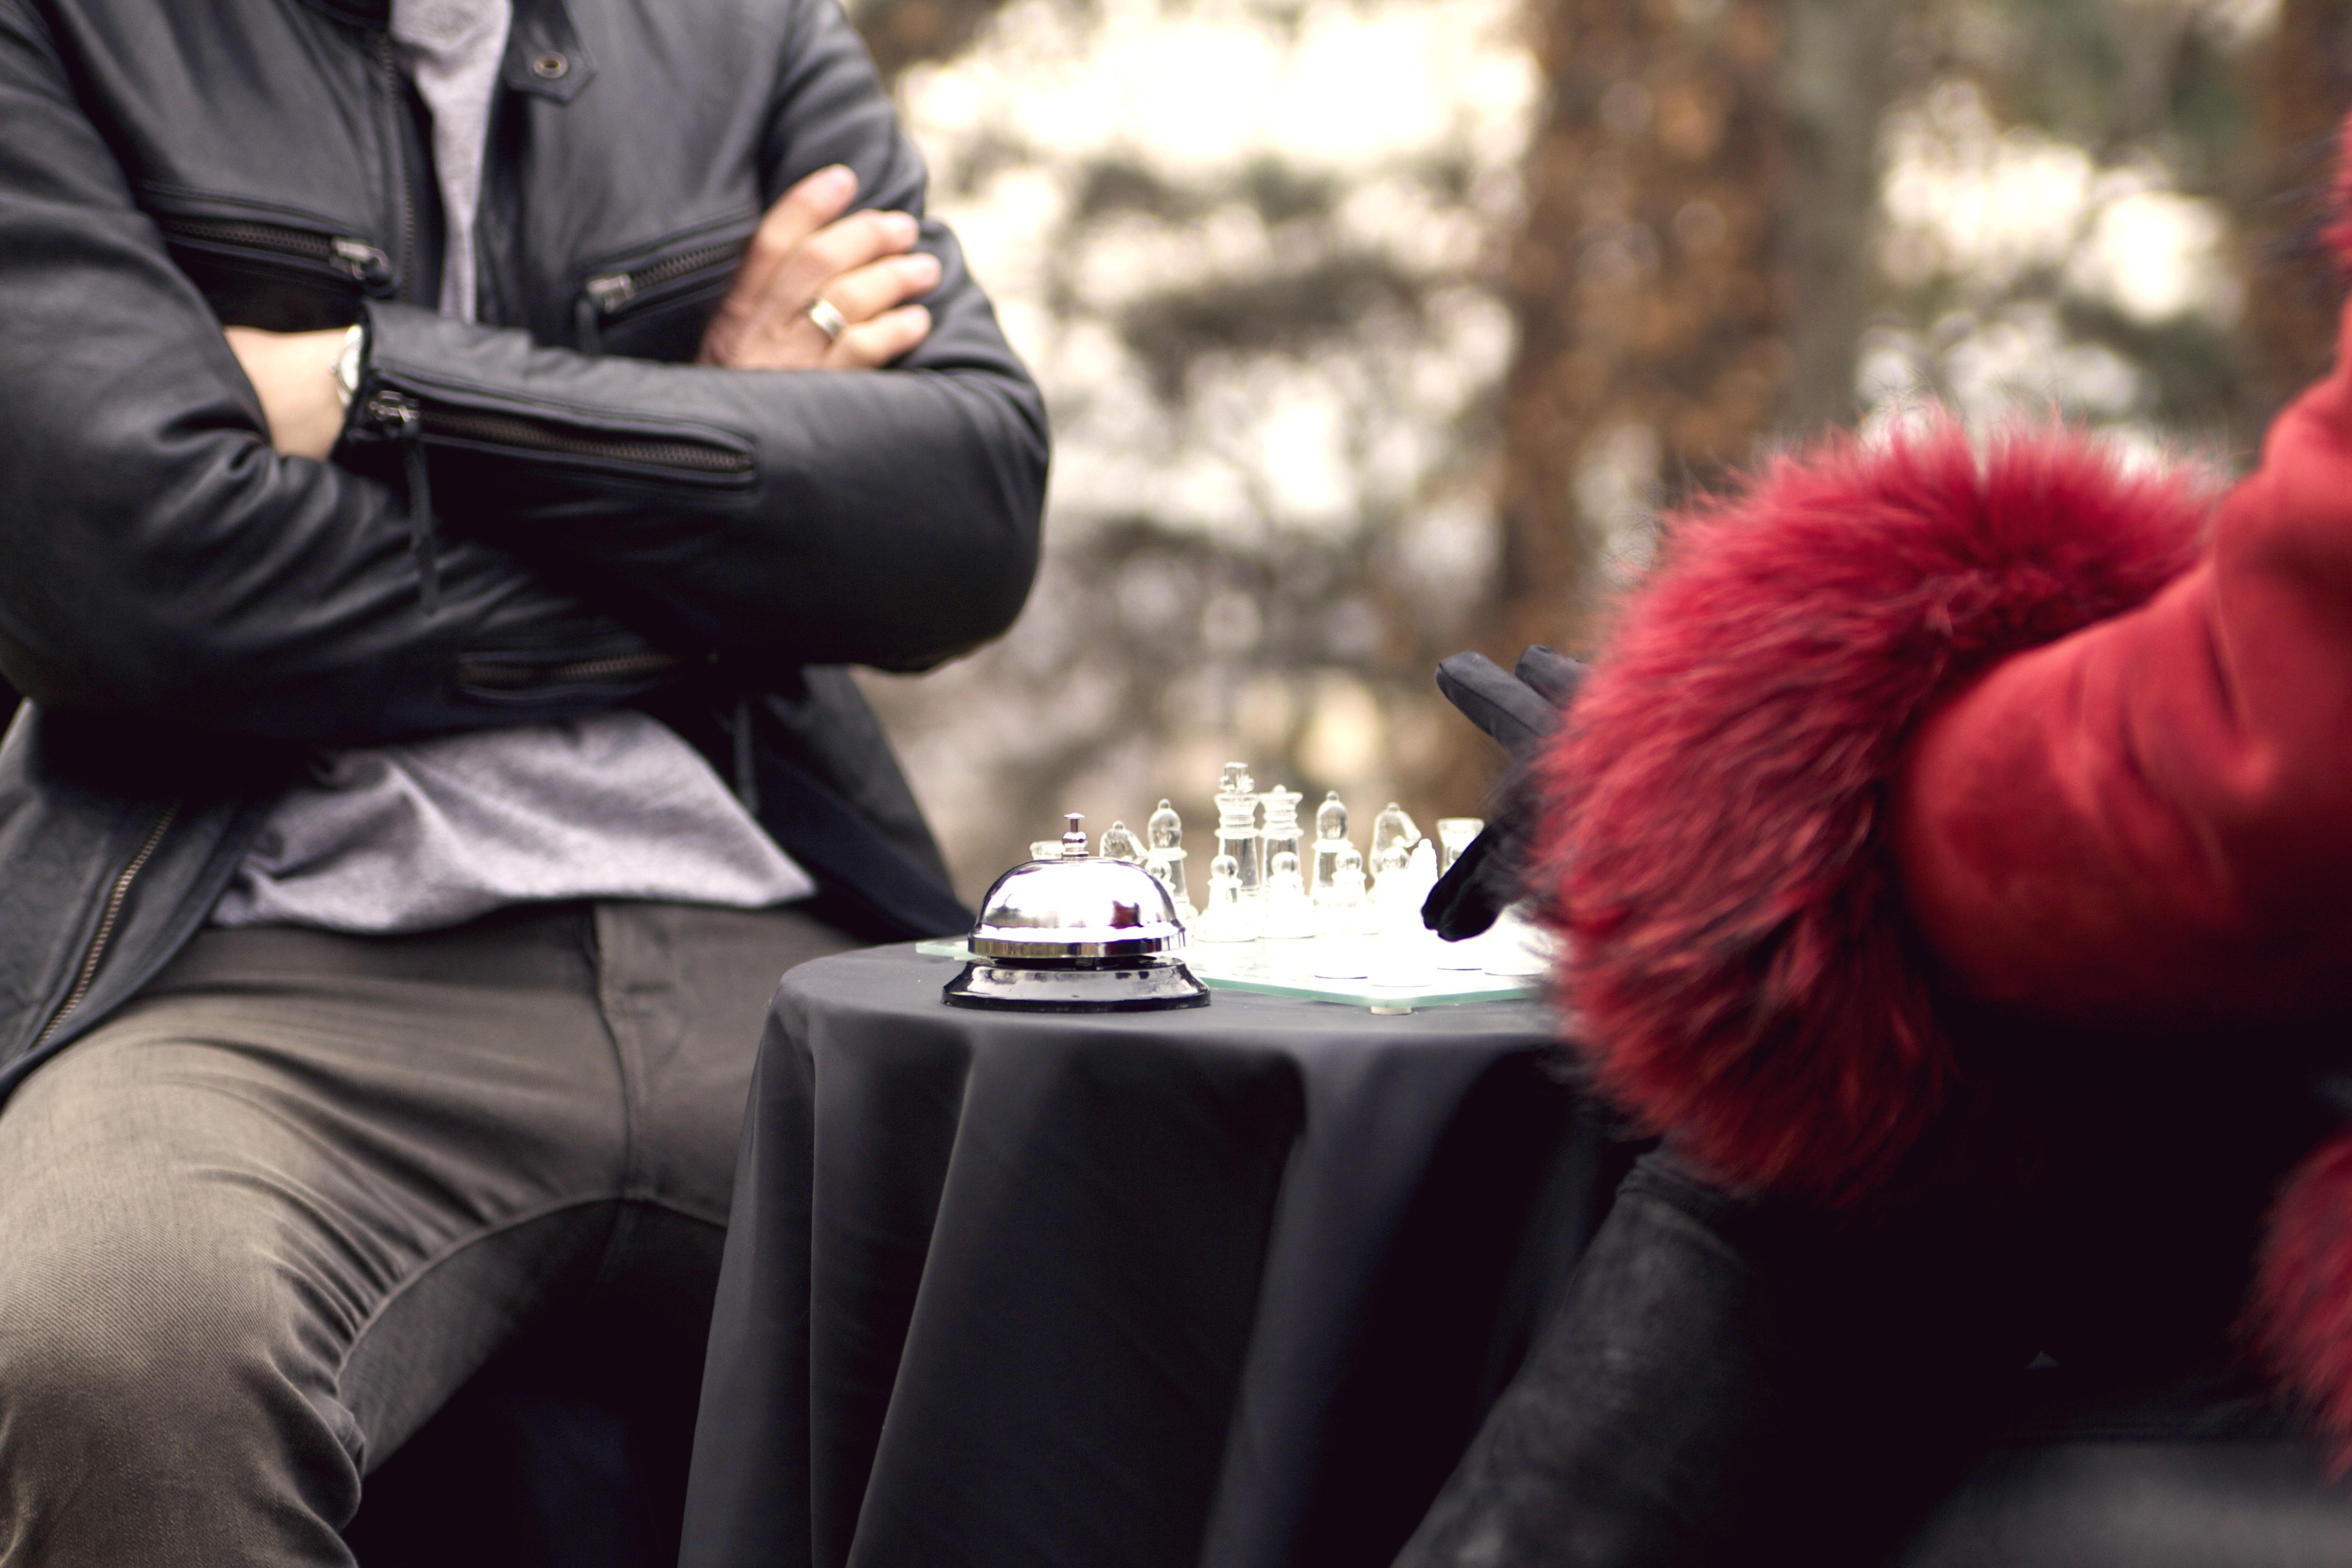 Costard Cravate 4 Gay Vidéos Et Photos Hommes Sexy Et Gentlemen TBM